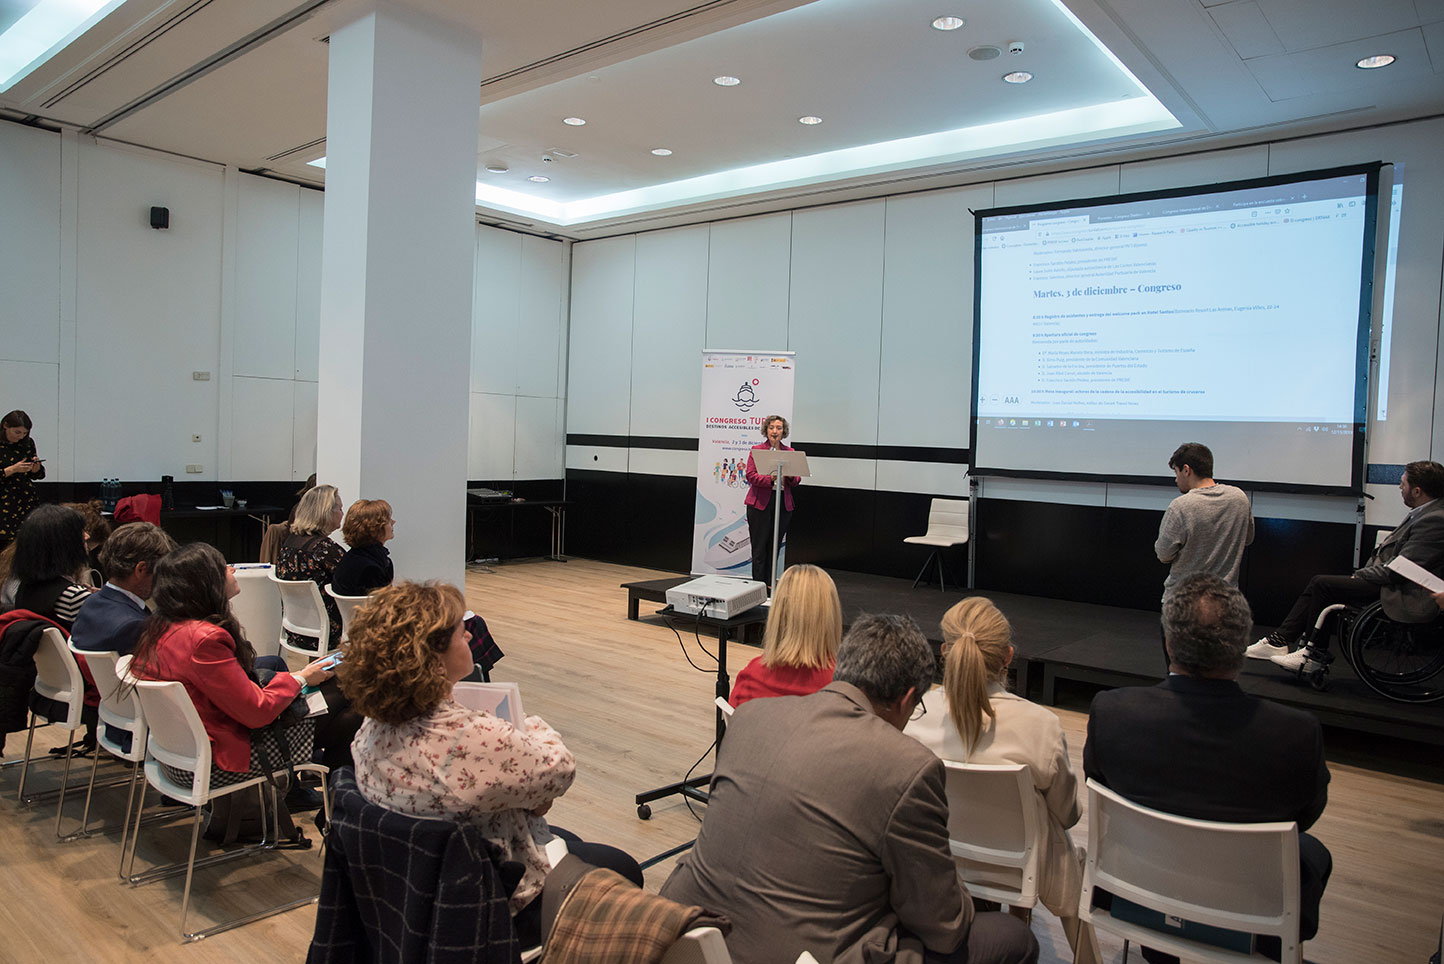 Tatiana-Aleman-Presentation-Congress-Madrid-in-November